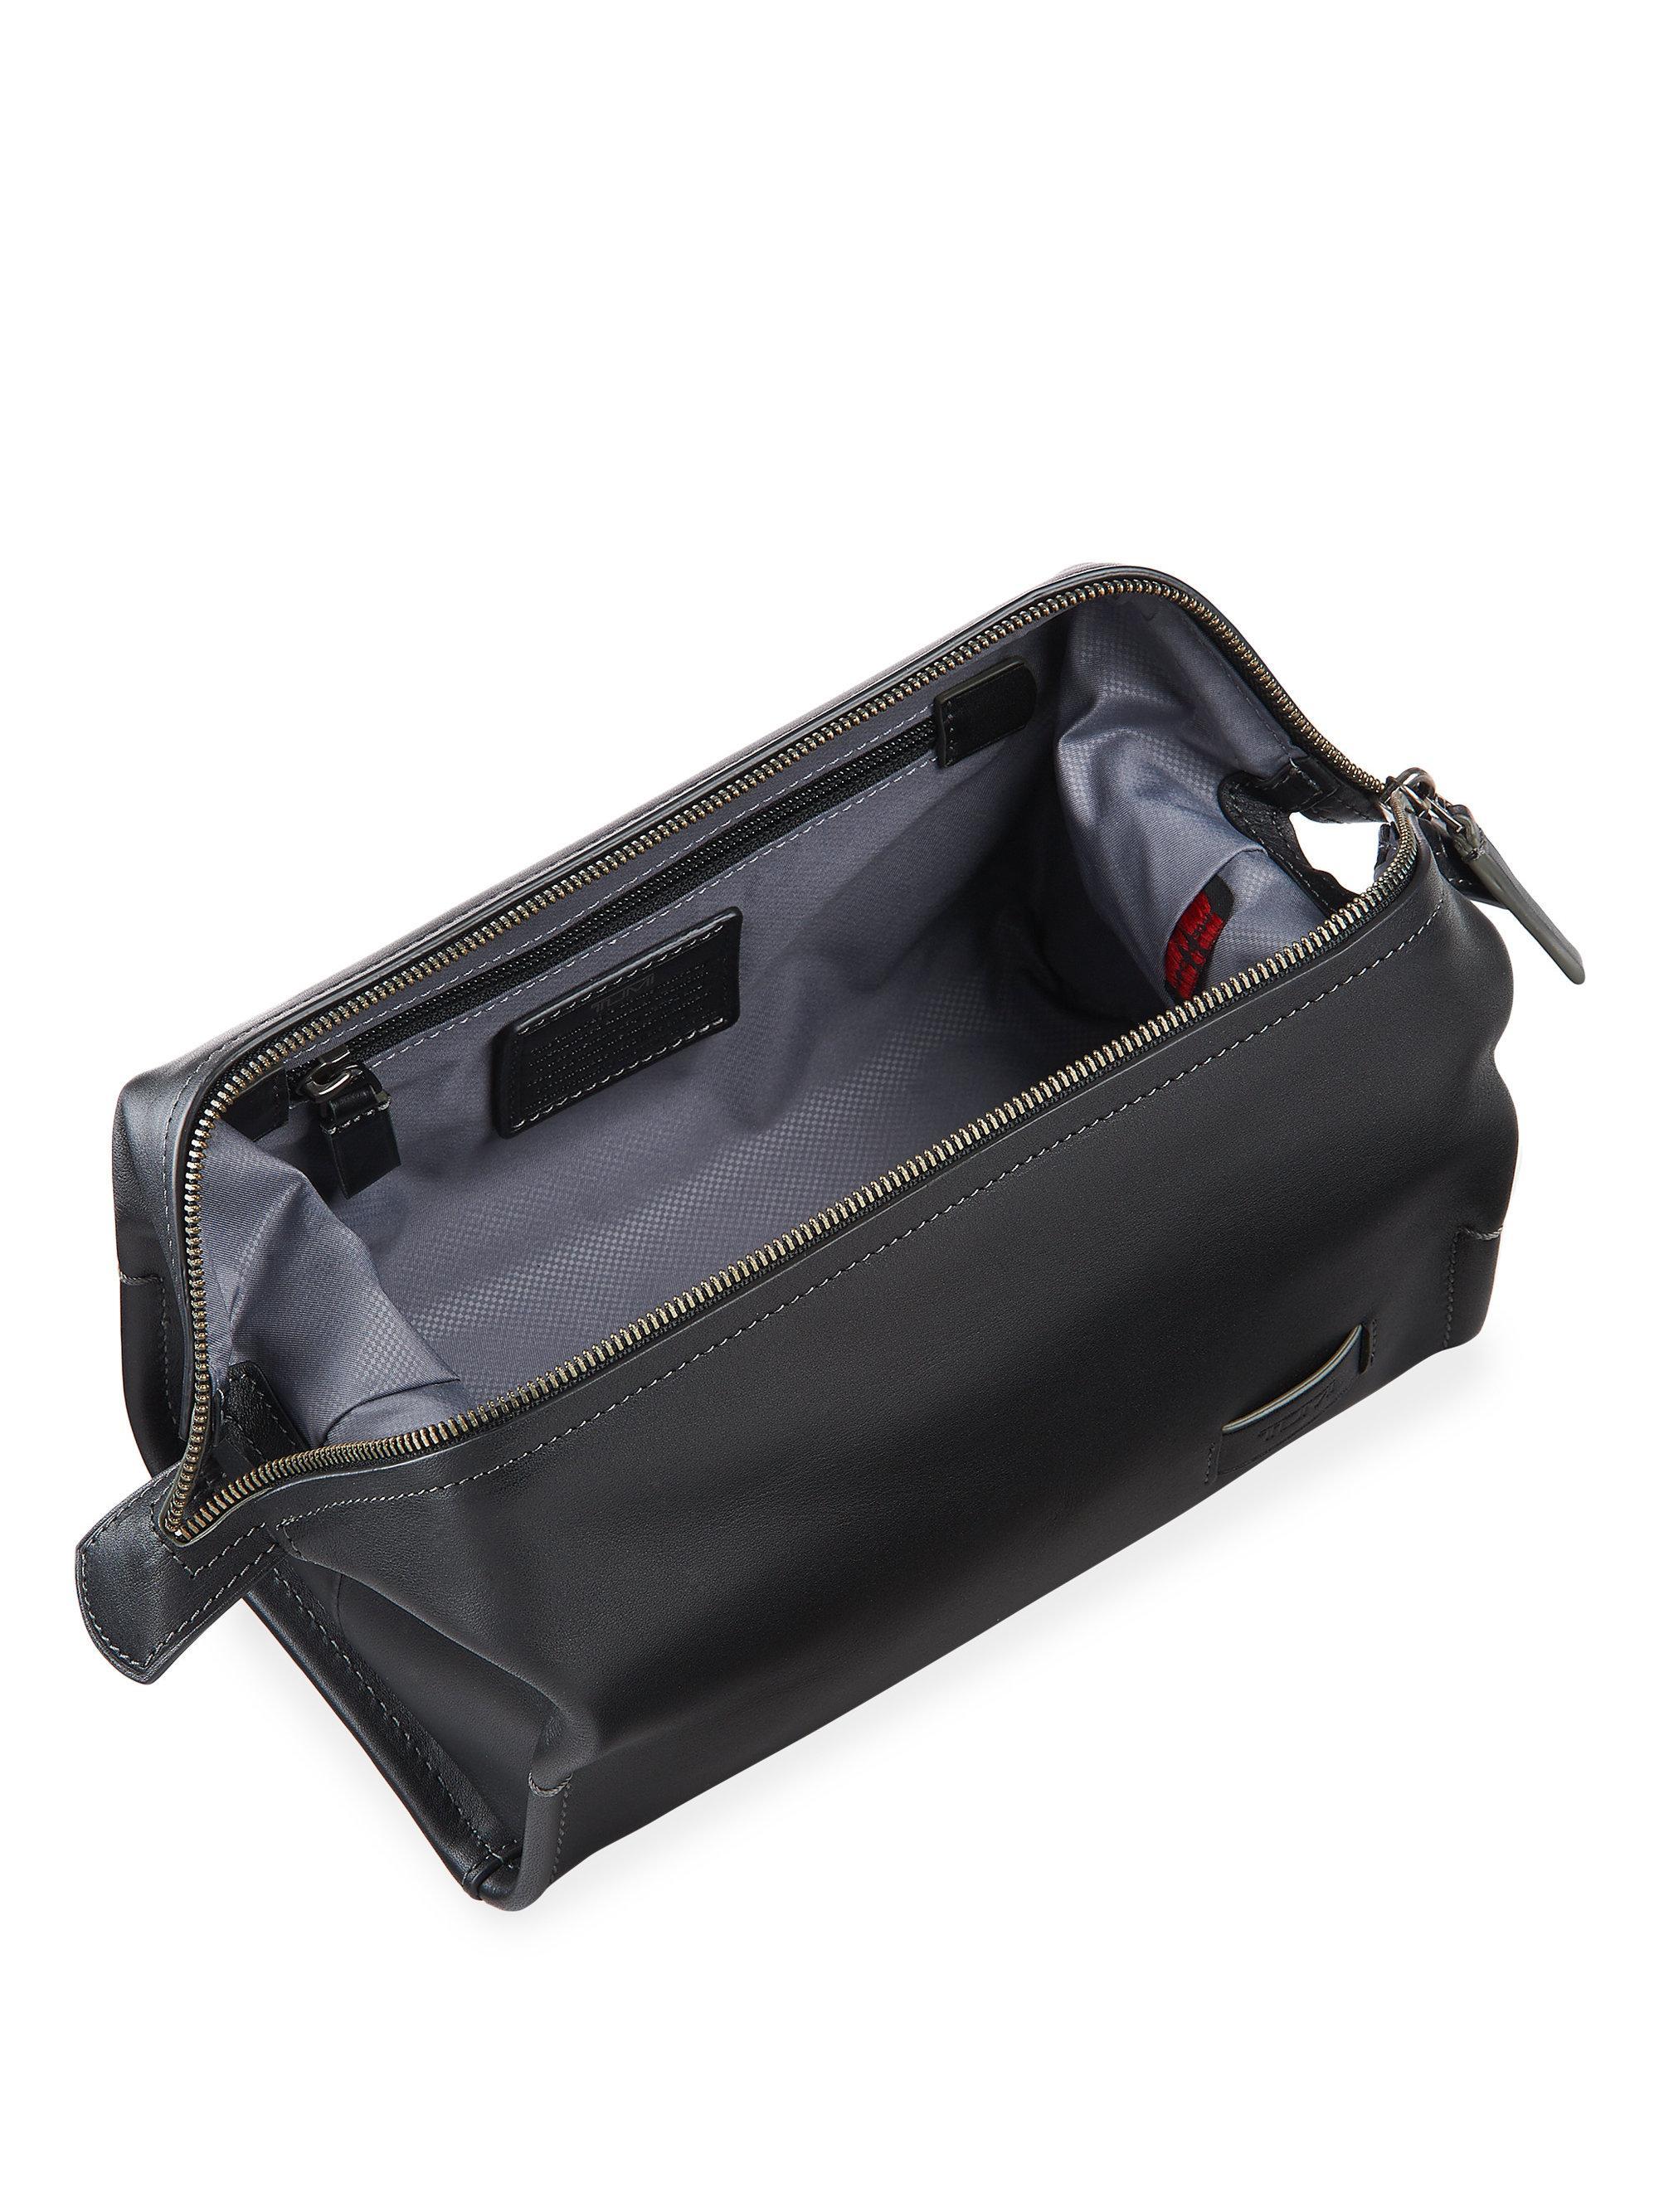 Tumi Harrison Brookside Leather Travel Kit in Black - Lyst